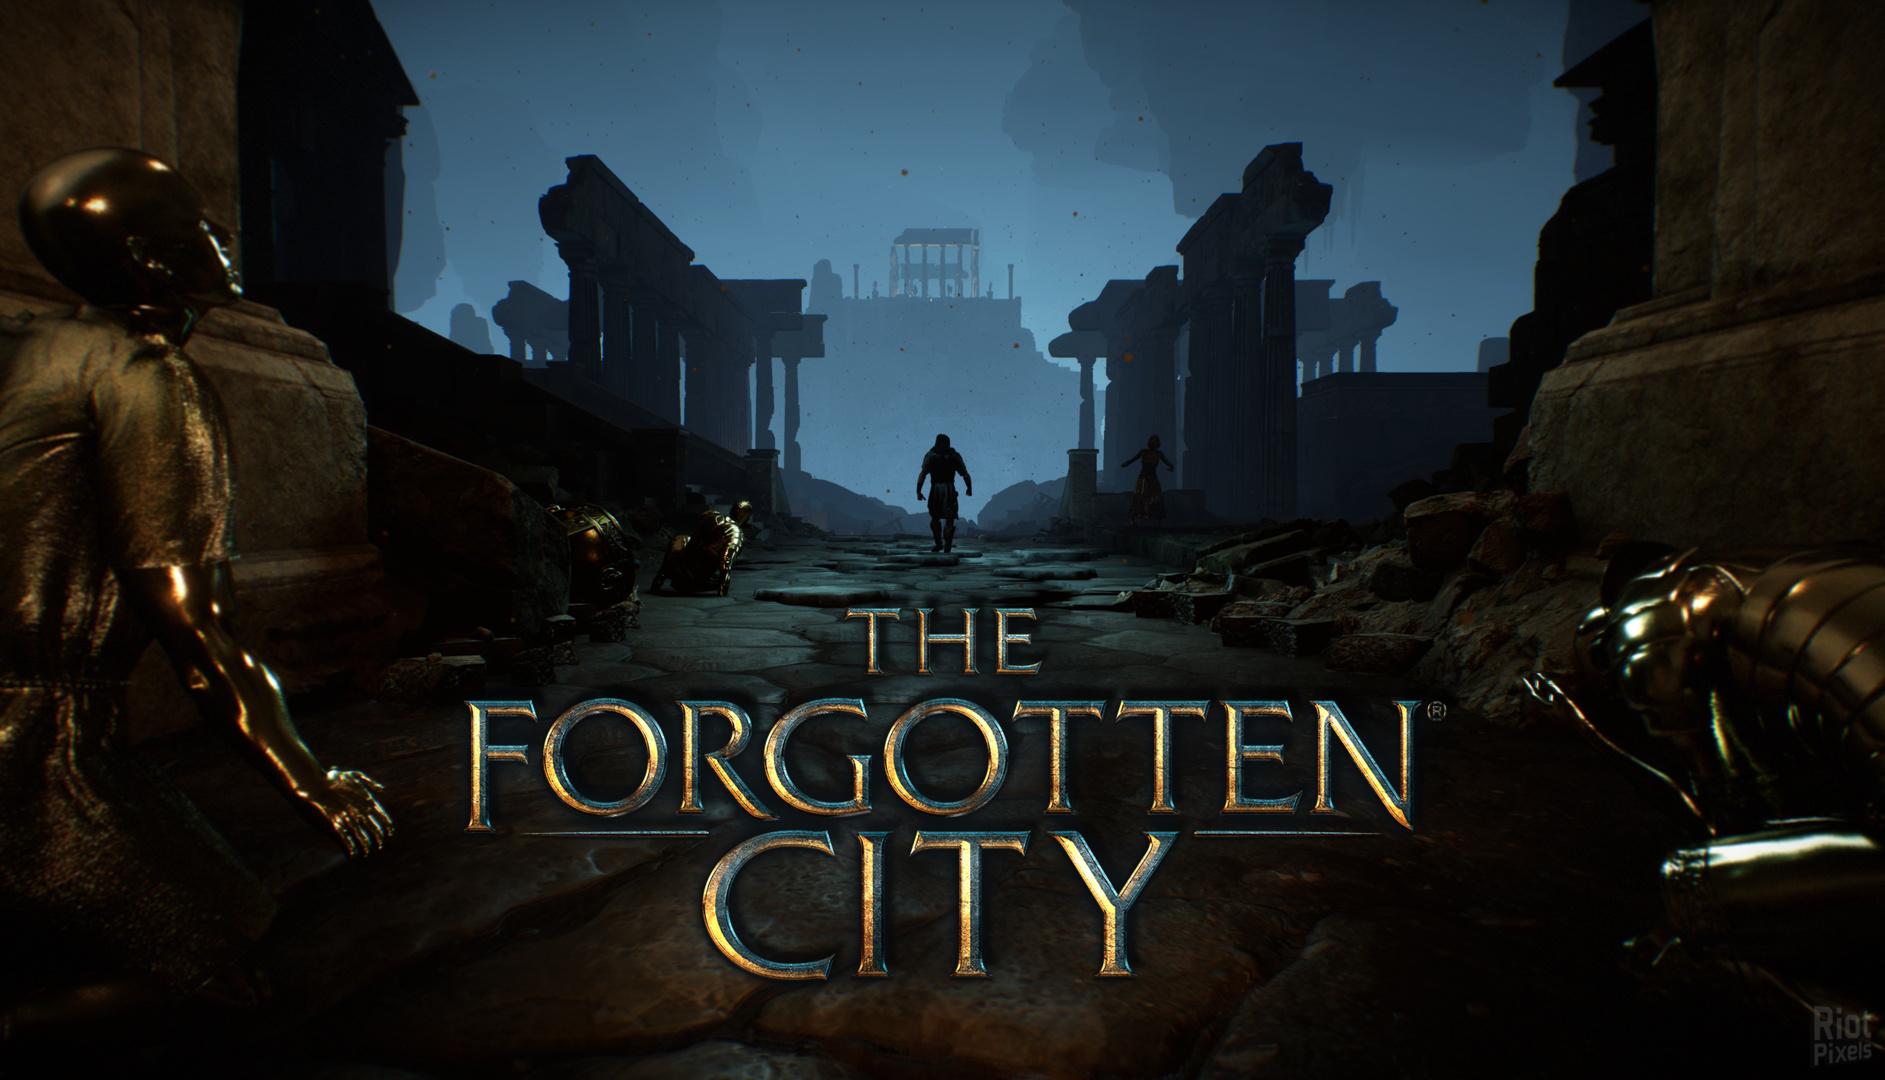 artwork.forgotten-city.1885x1080.2019-12-18.15.jpg